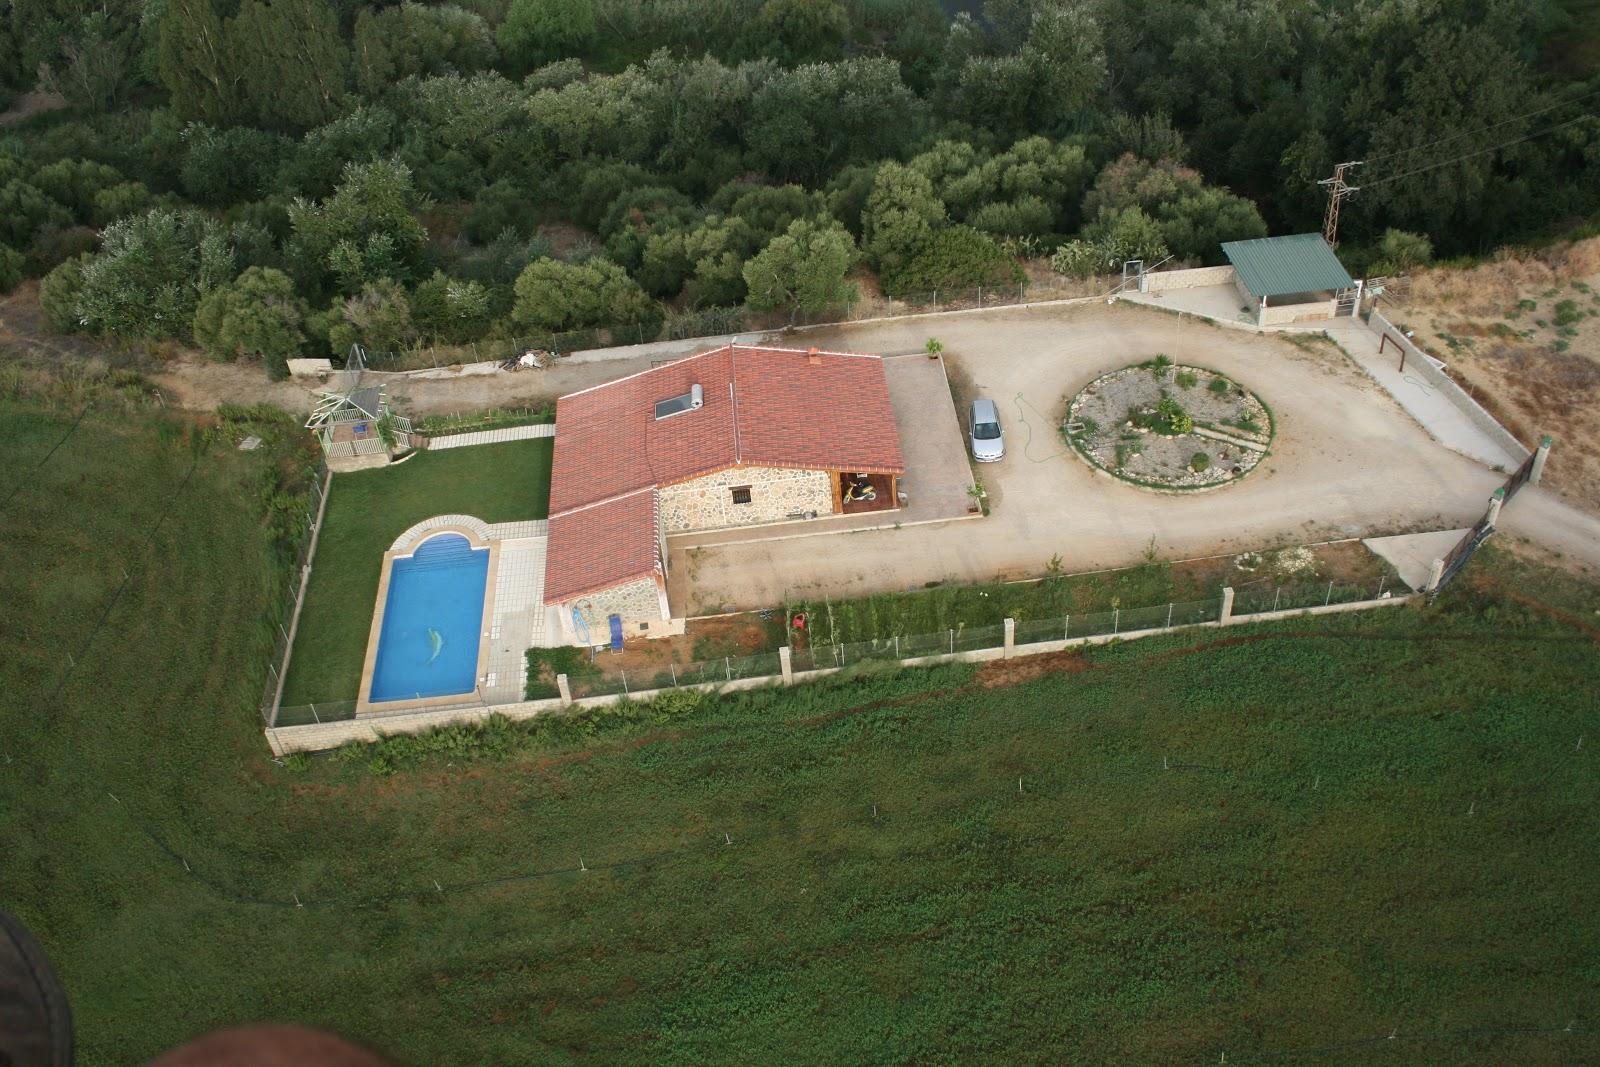 Alquiler rural casa independiente for Casa rural con piscina independiente